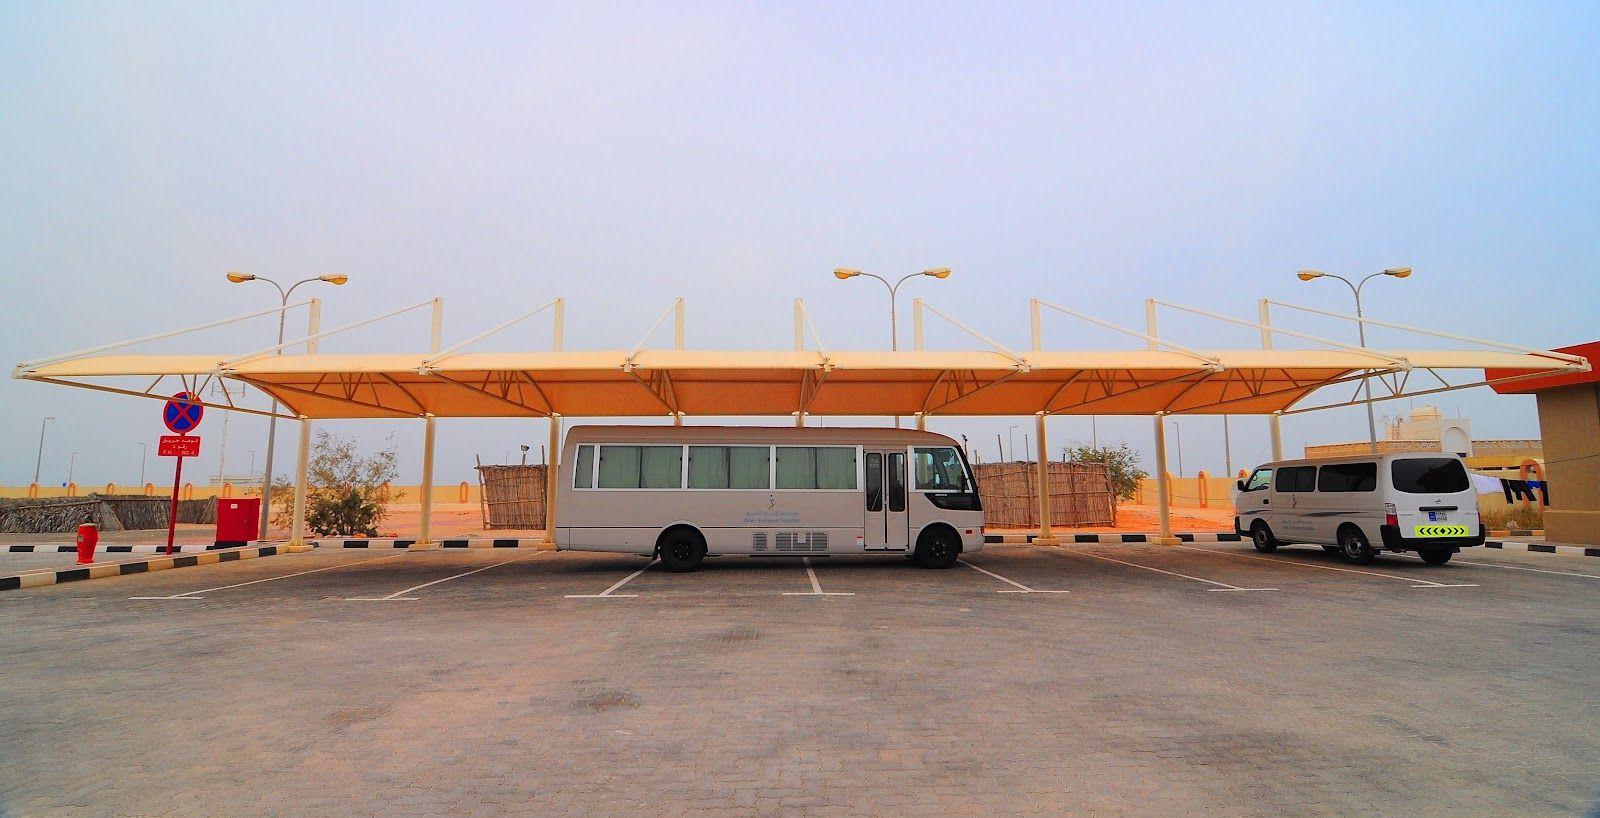 Bus Parking Shade Canopy Park Shade Car Parking Shade Canopy